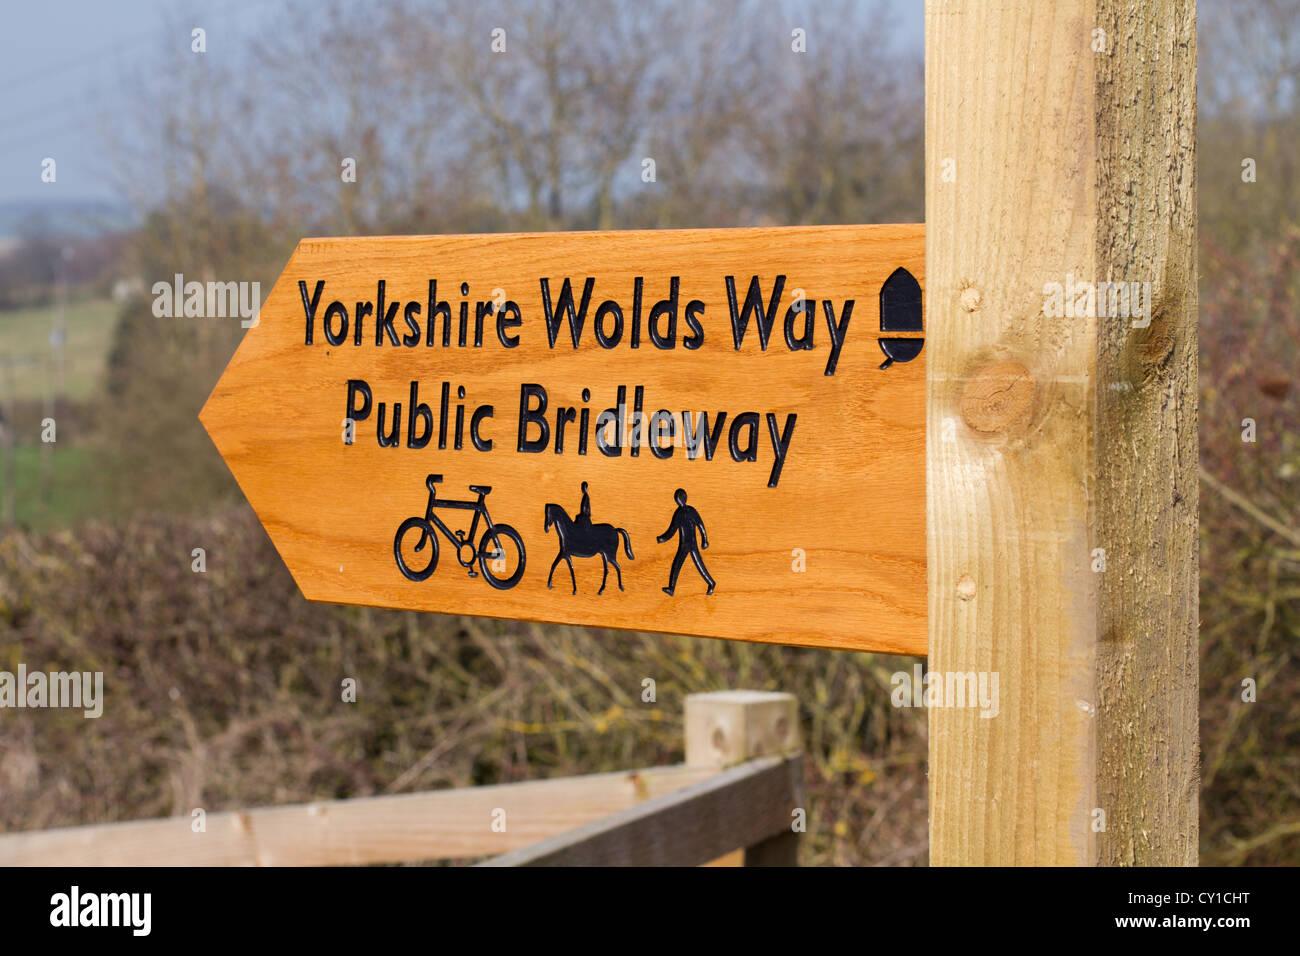 Yorkshire Wolds Way Public Bridleway sign Market Weighton - Stock Image